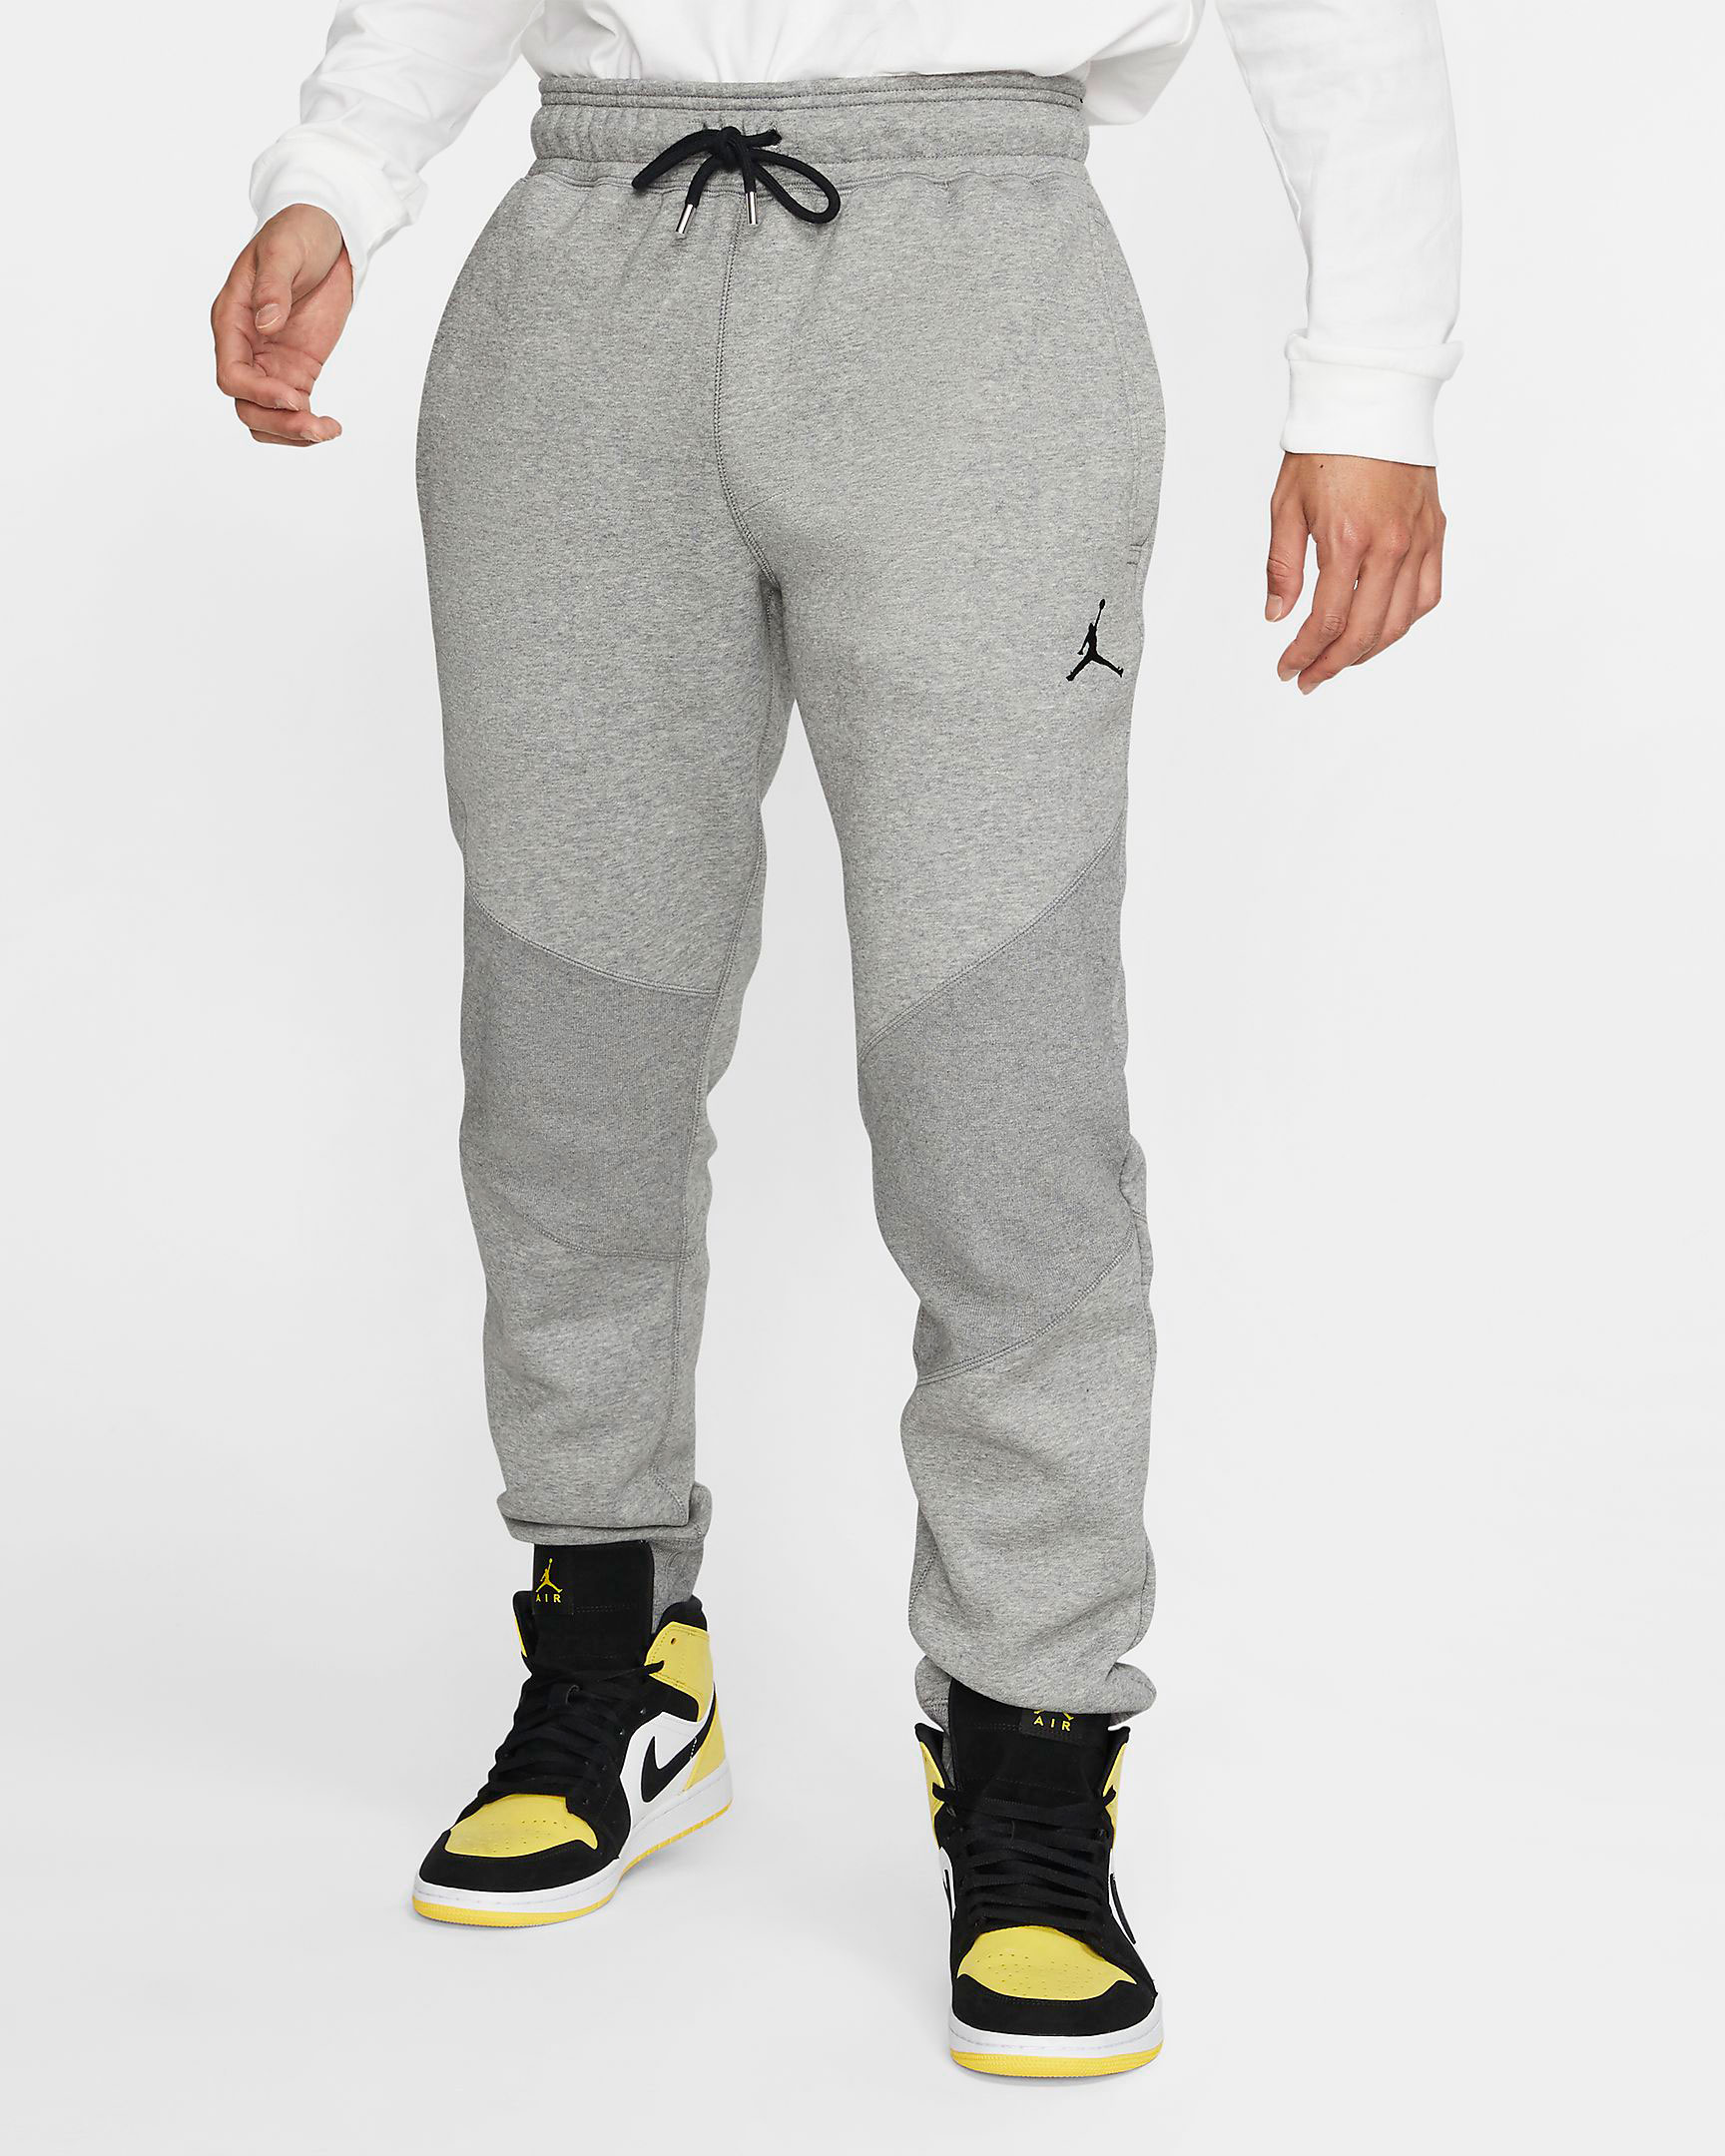 jordan-wings-fleece-pants-grey-1